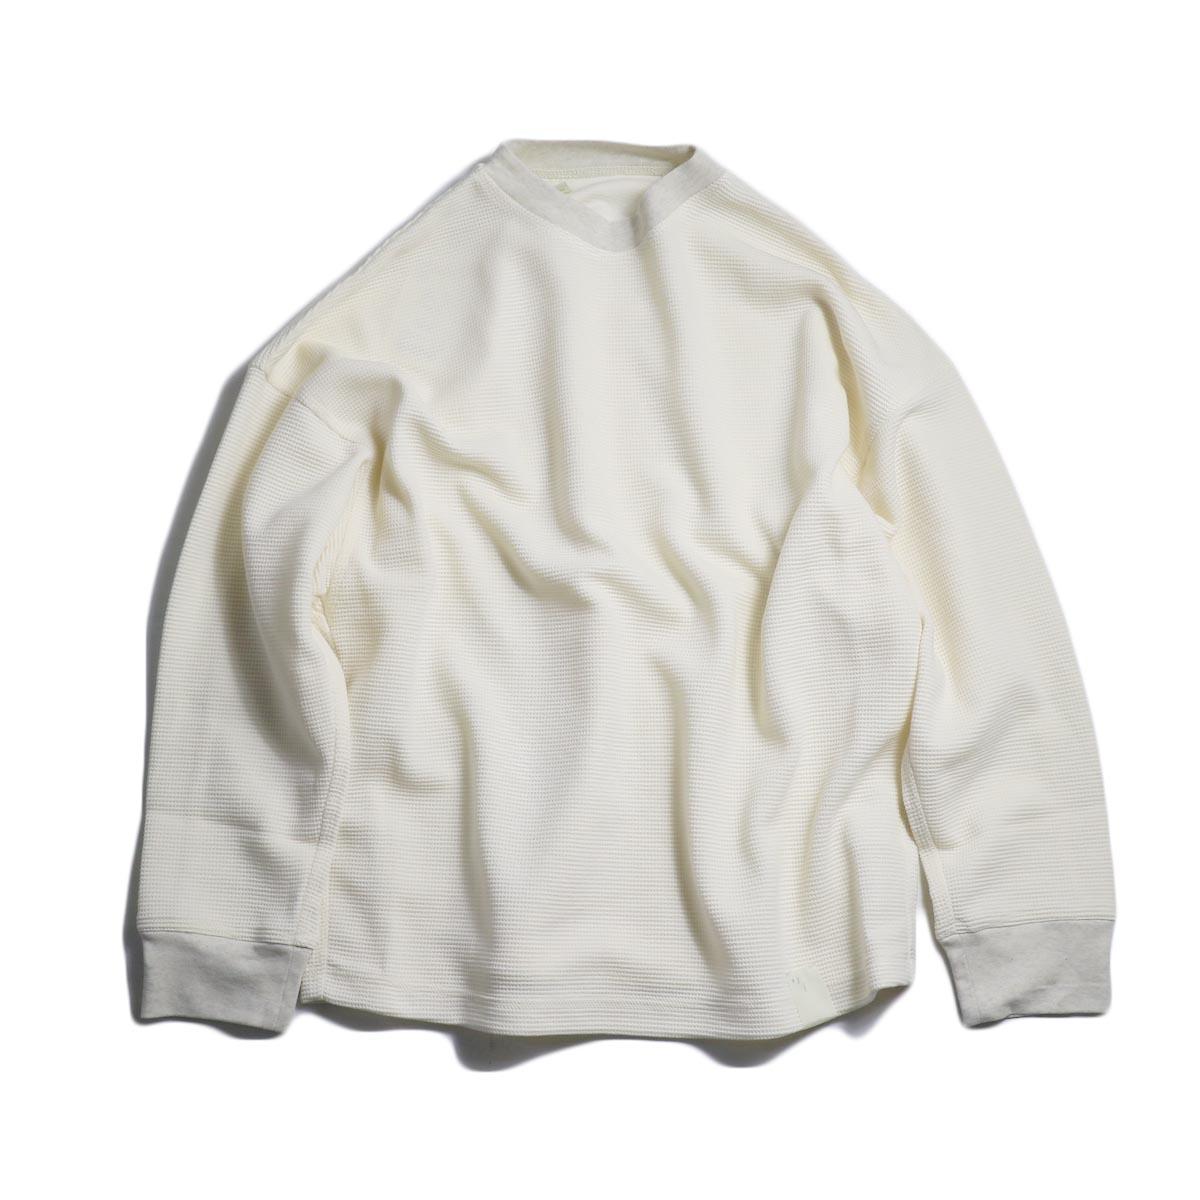 N.HOOLYWOOD / 182-CS07-013-pieces WAFFLE SWEAT CUT SEW -Ivory